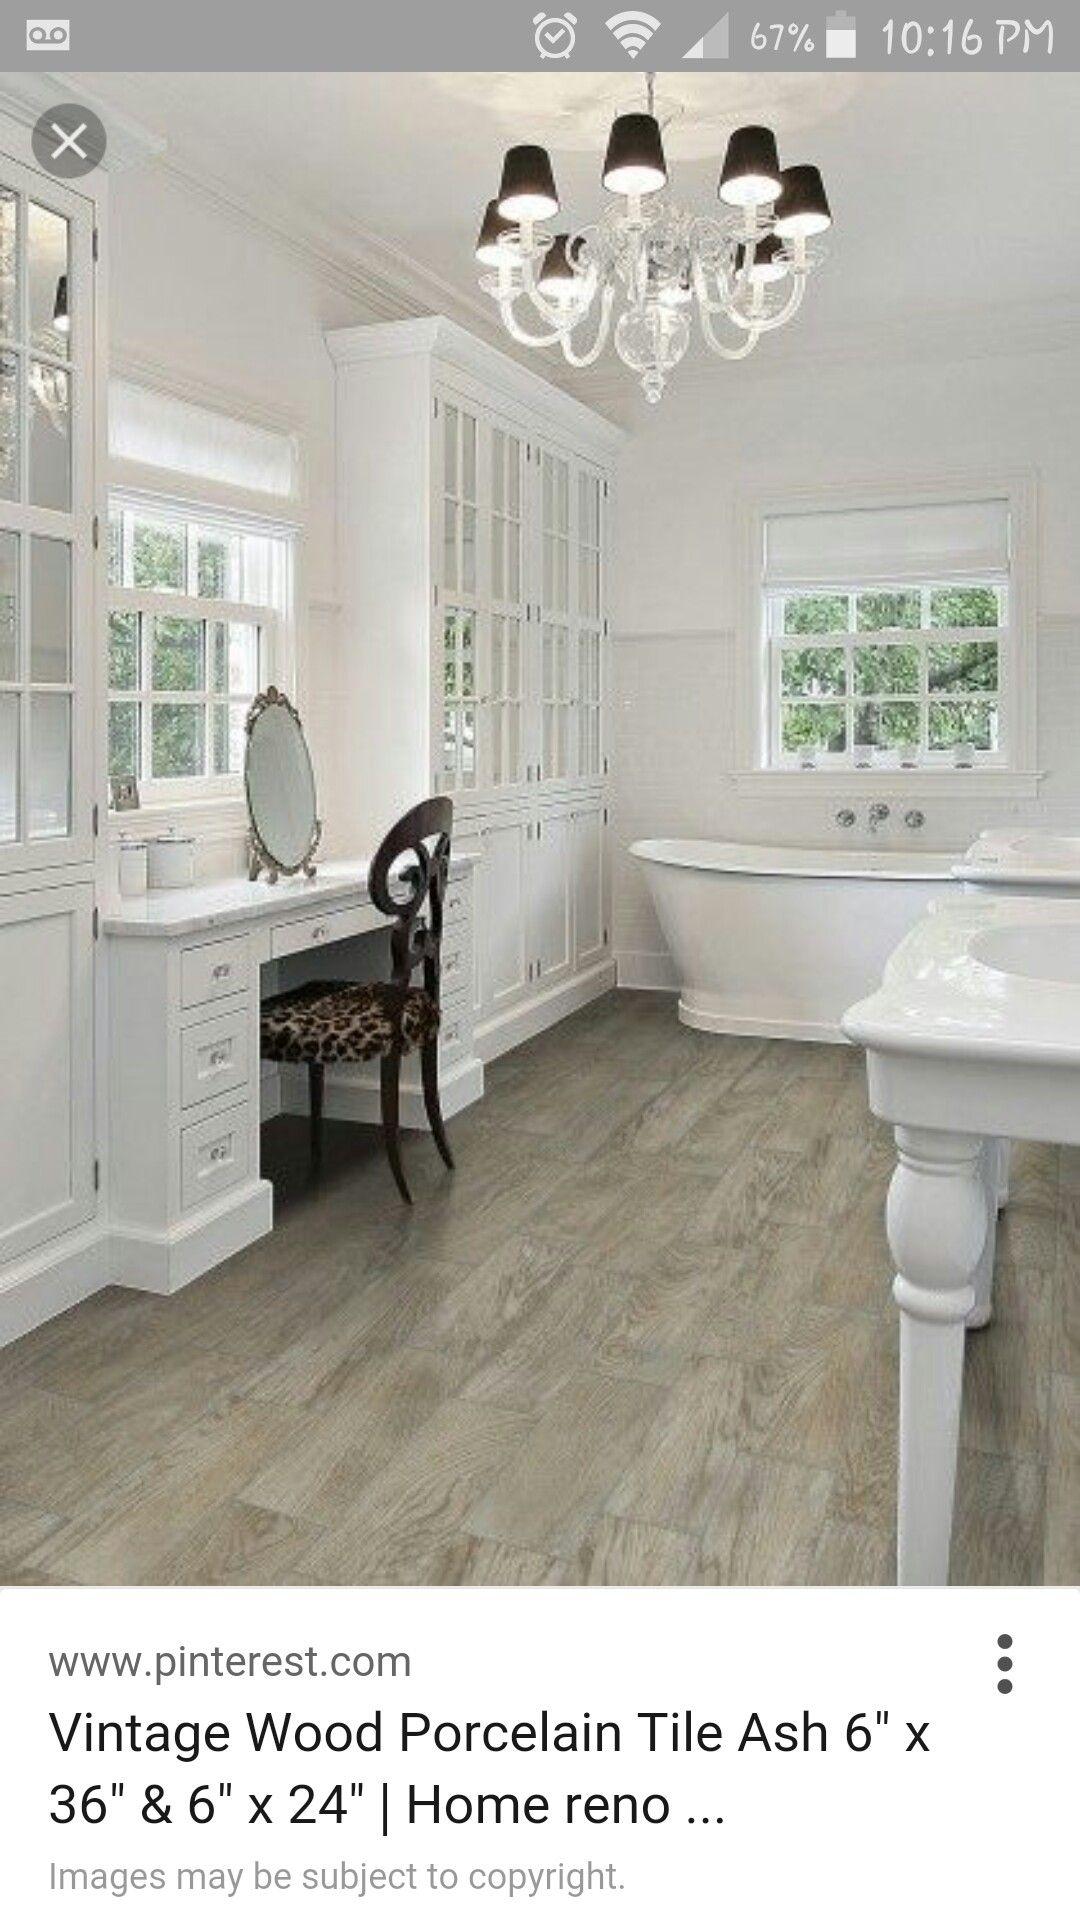 Ash wood ceramic tile floors Soon to be Future Pinterest